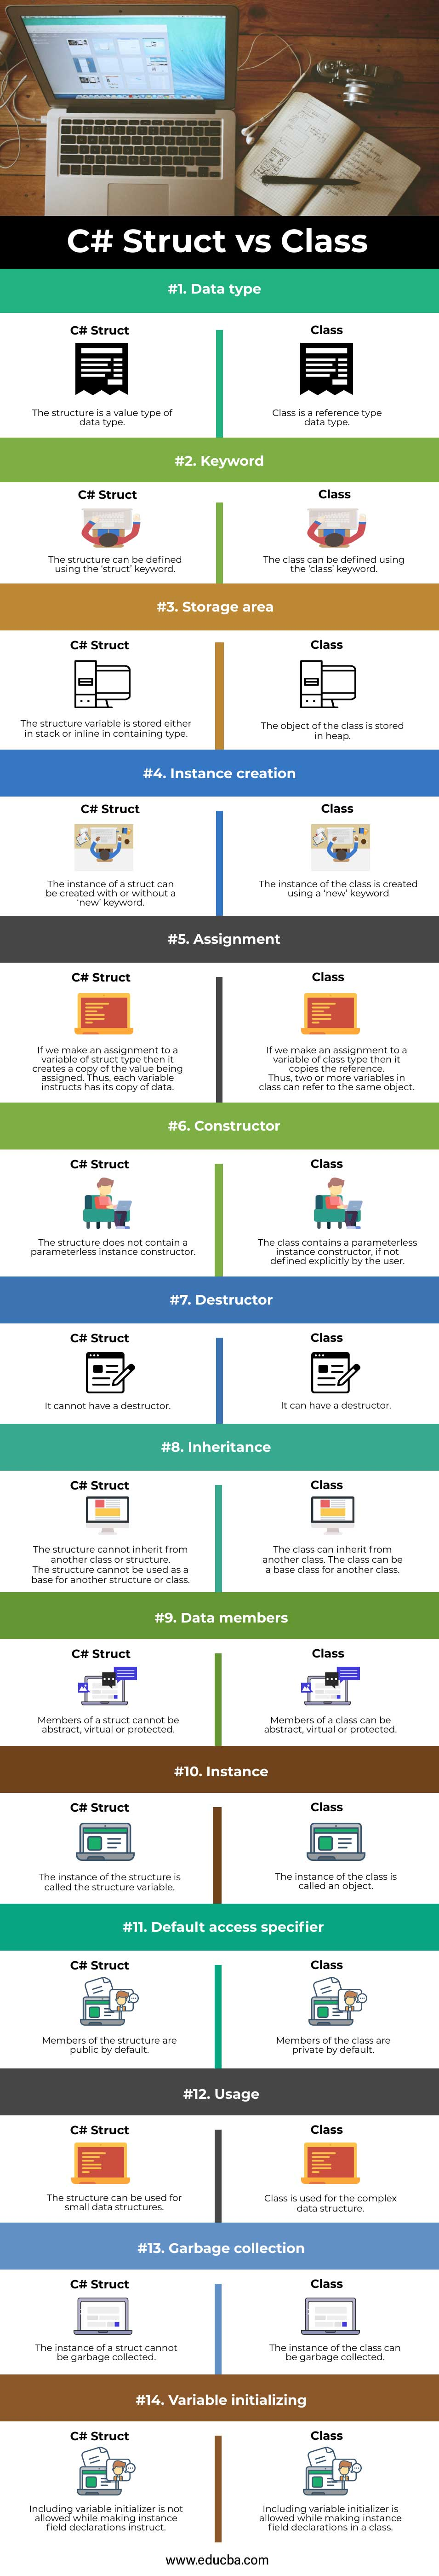 C#-Struct-vs-Class-info